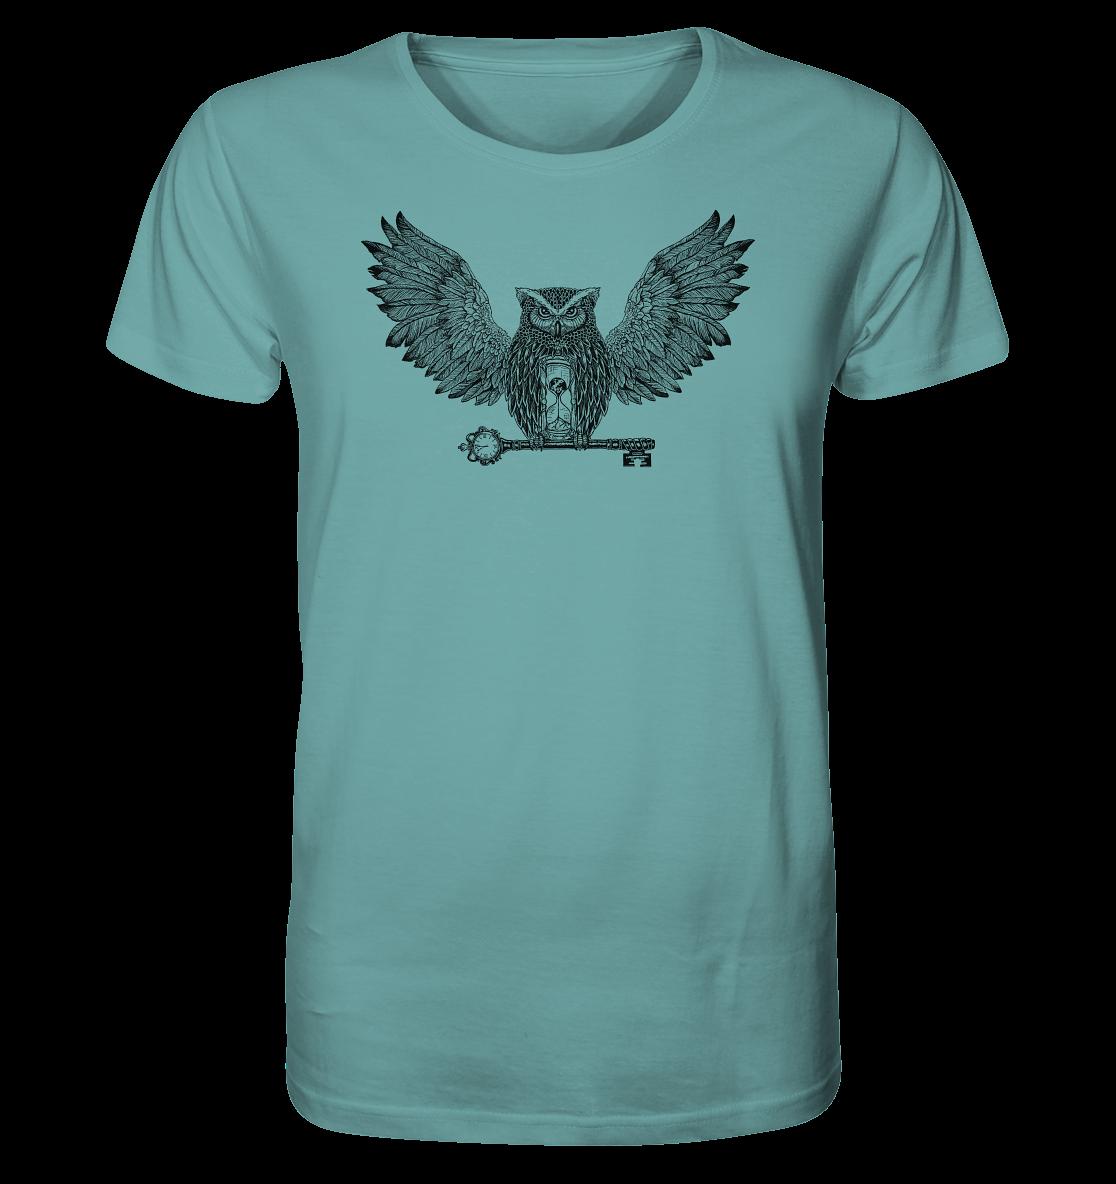 front-organic-shirt-70a7a7-1116x-4.png